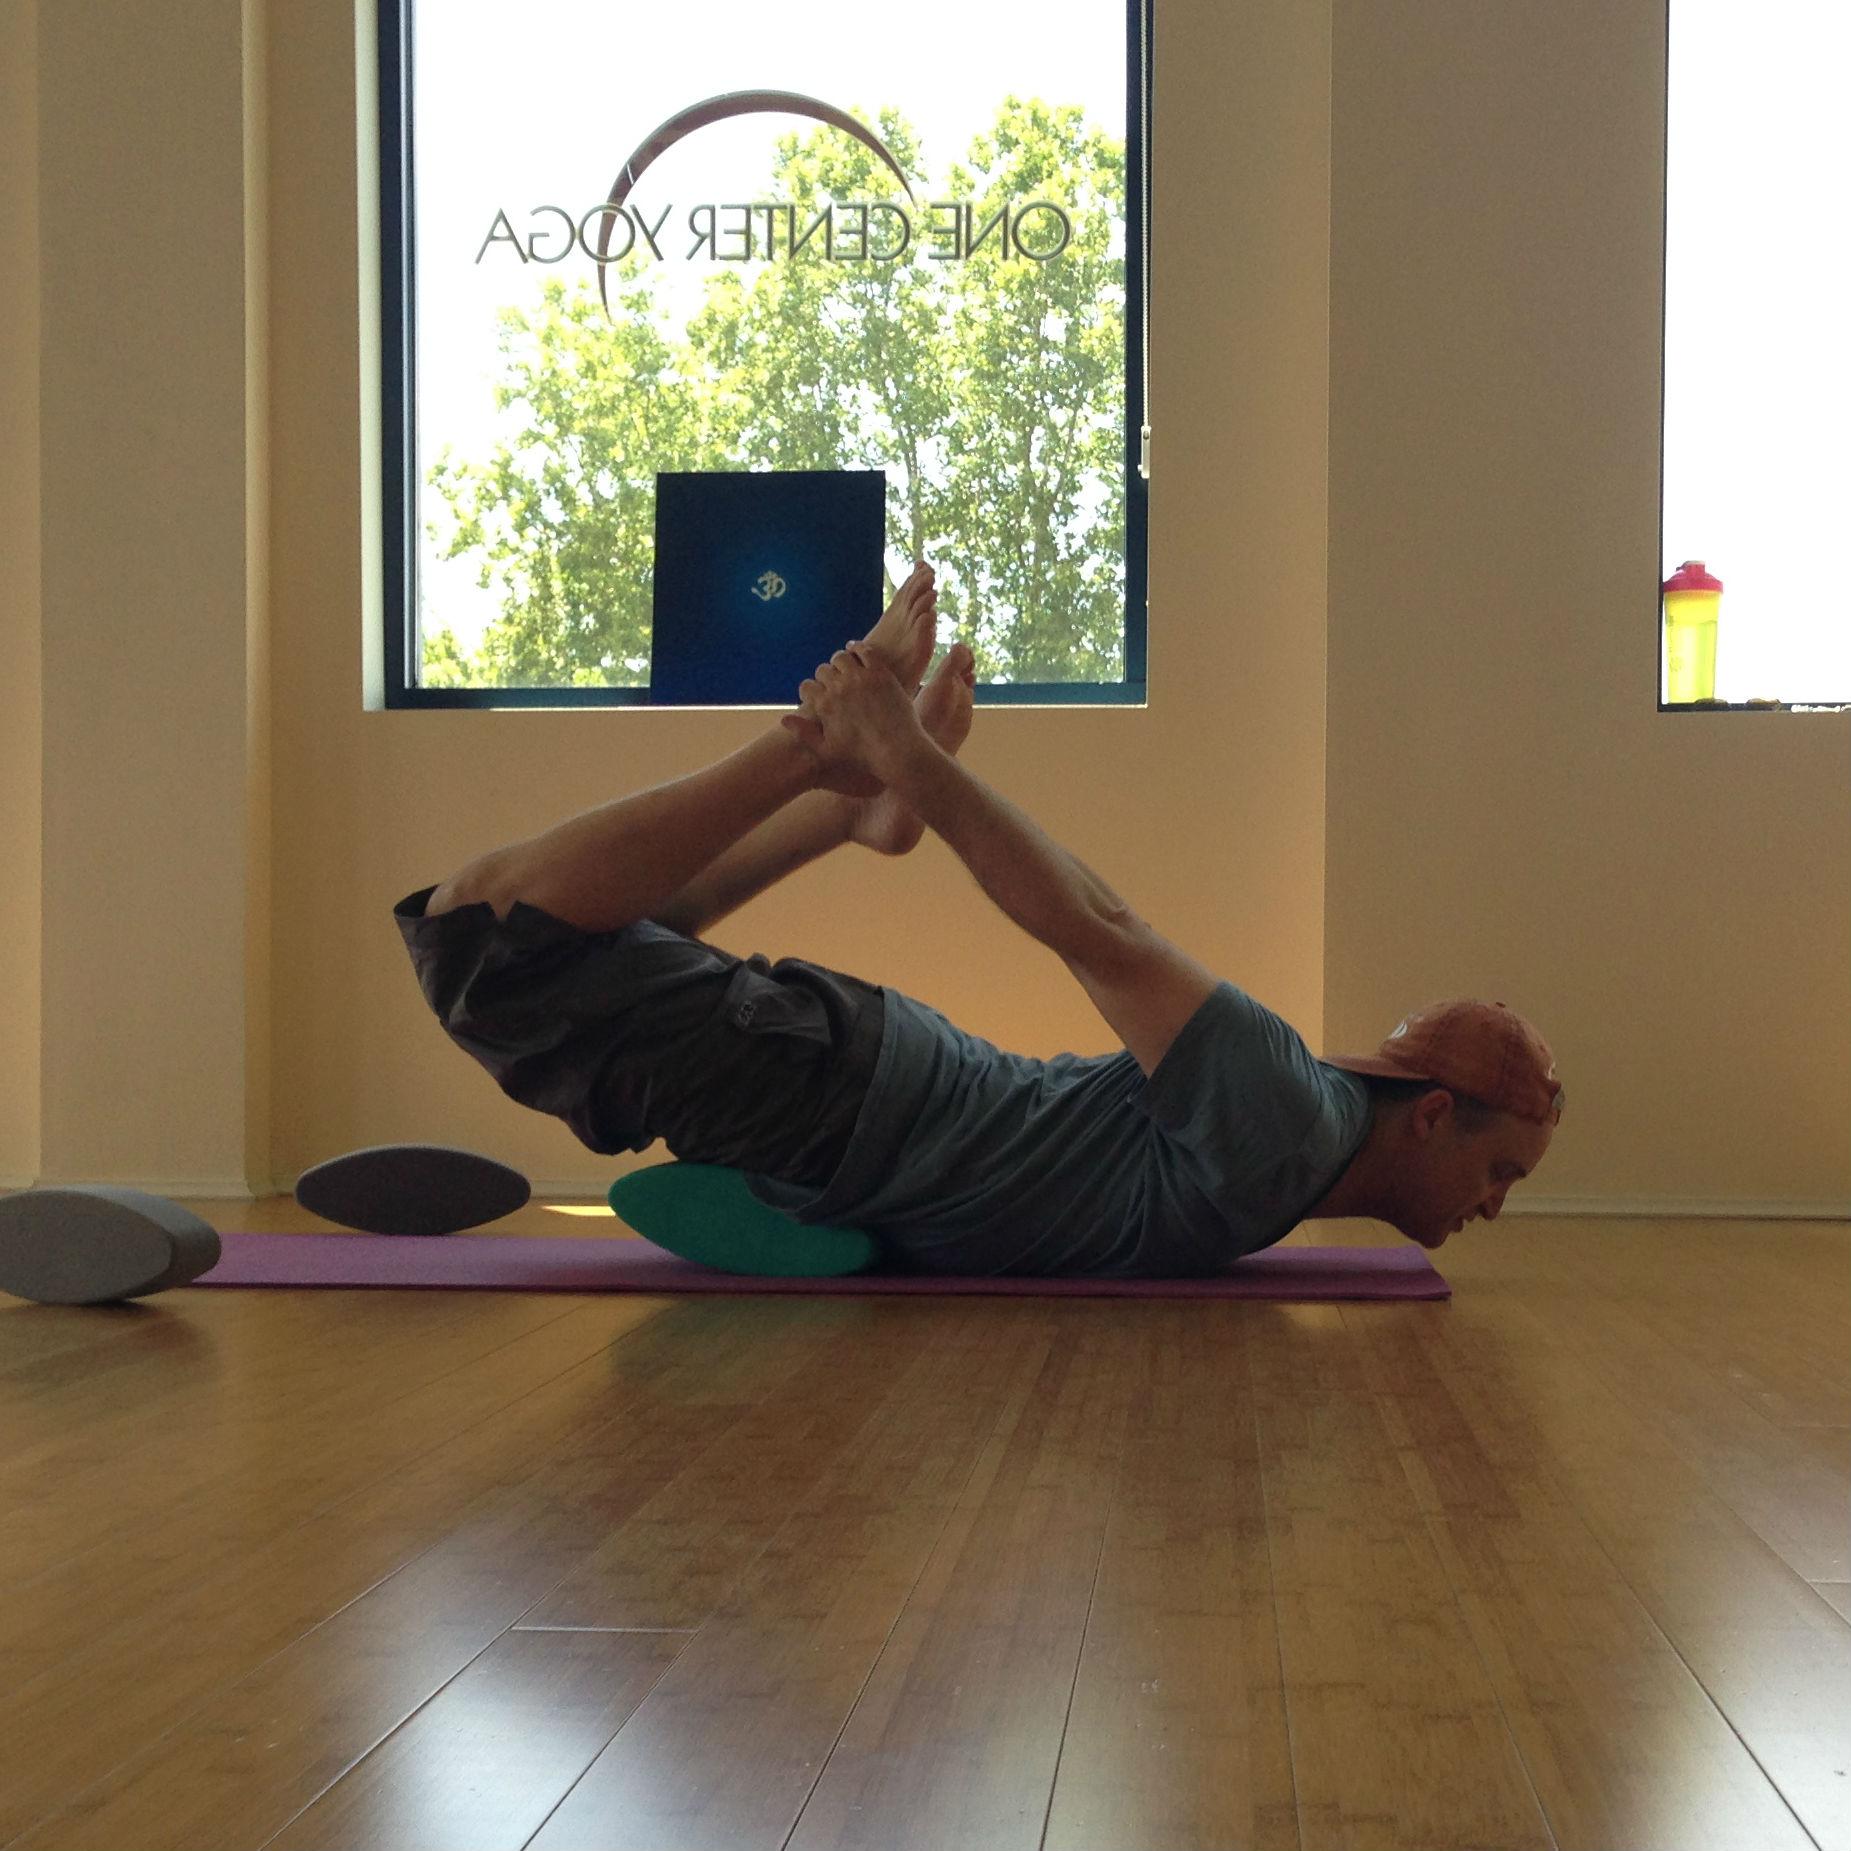 Tips for Bow Pose using ergonomic yoga blocks by Three Minute Egg